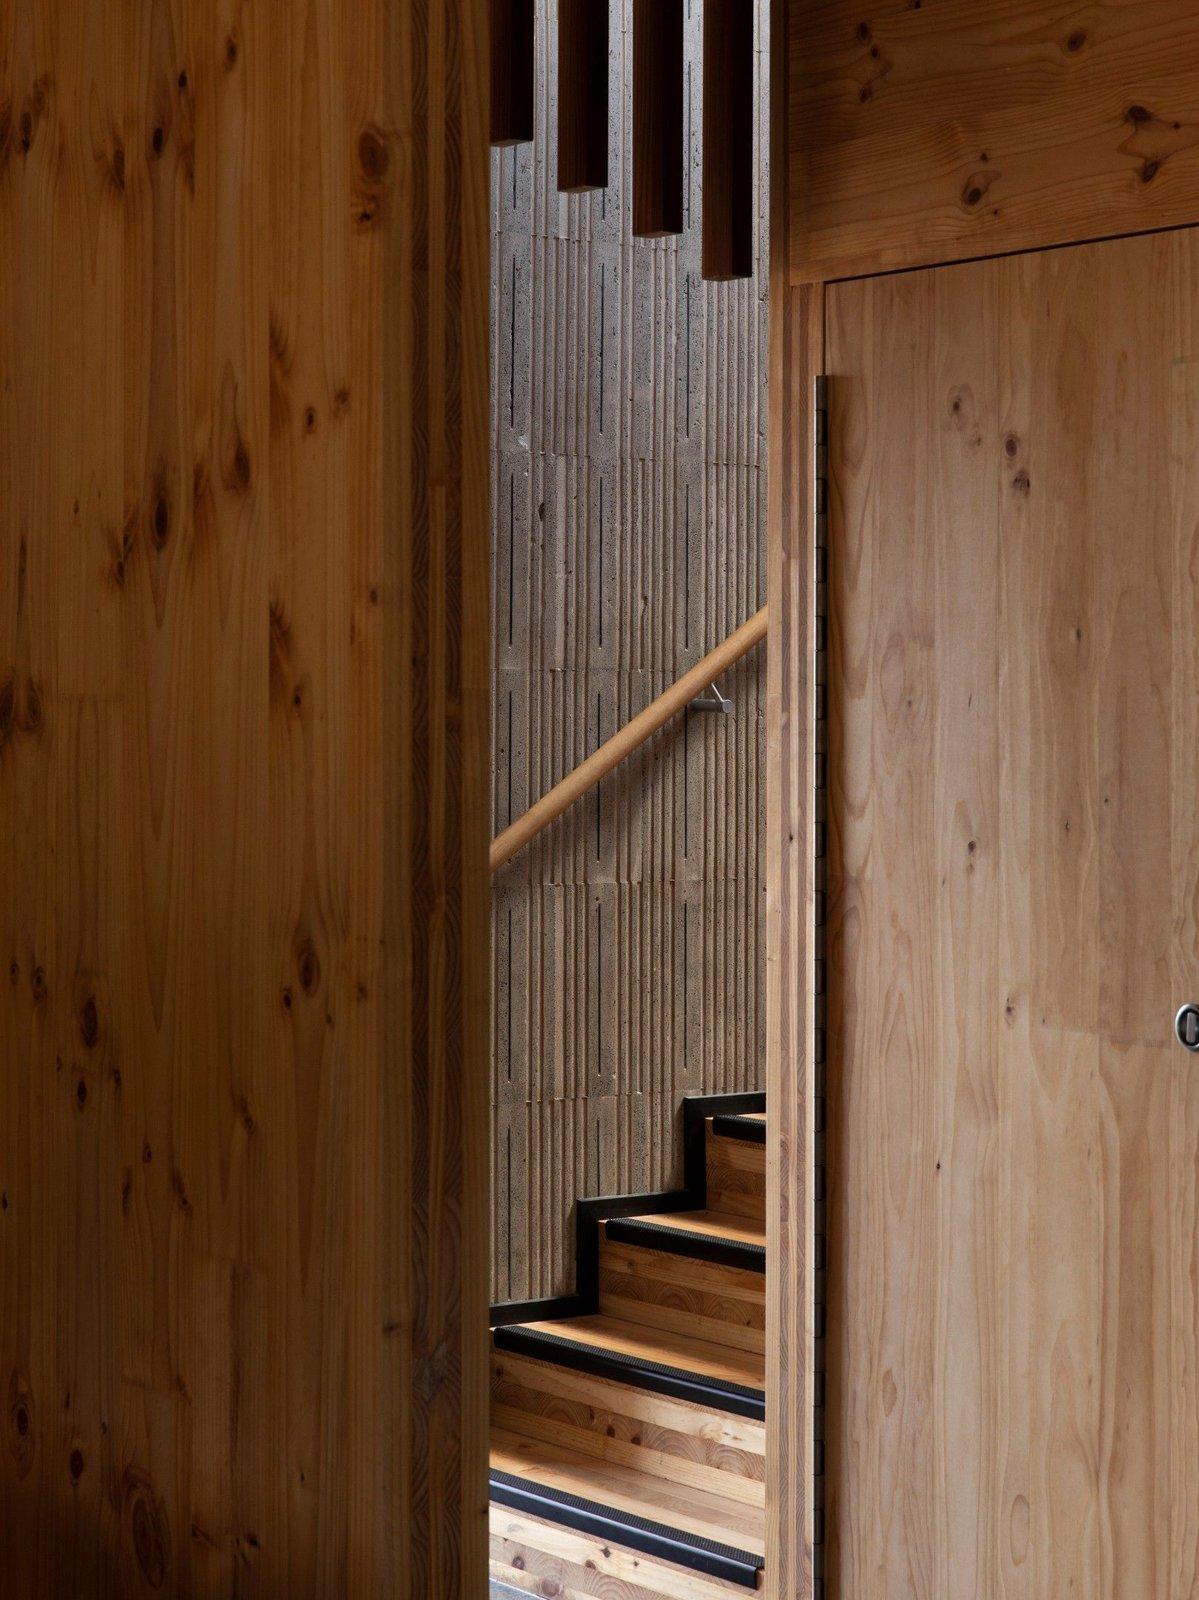 Stair of Tuarangi House by TOA Architects.